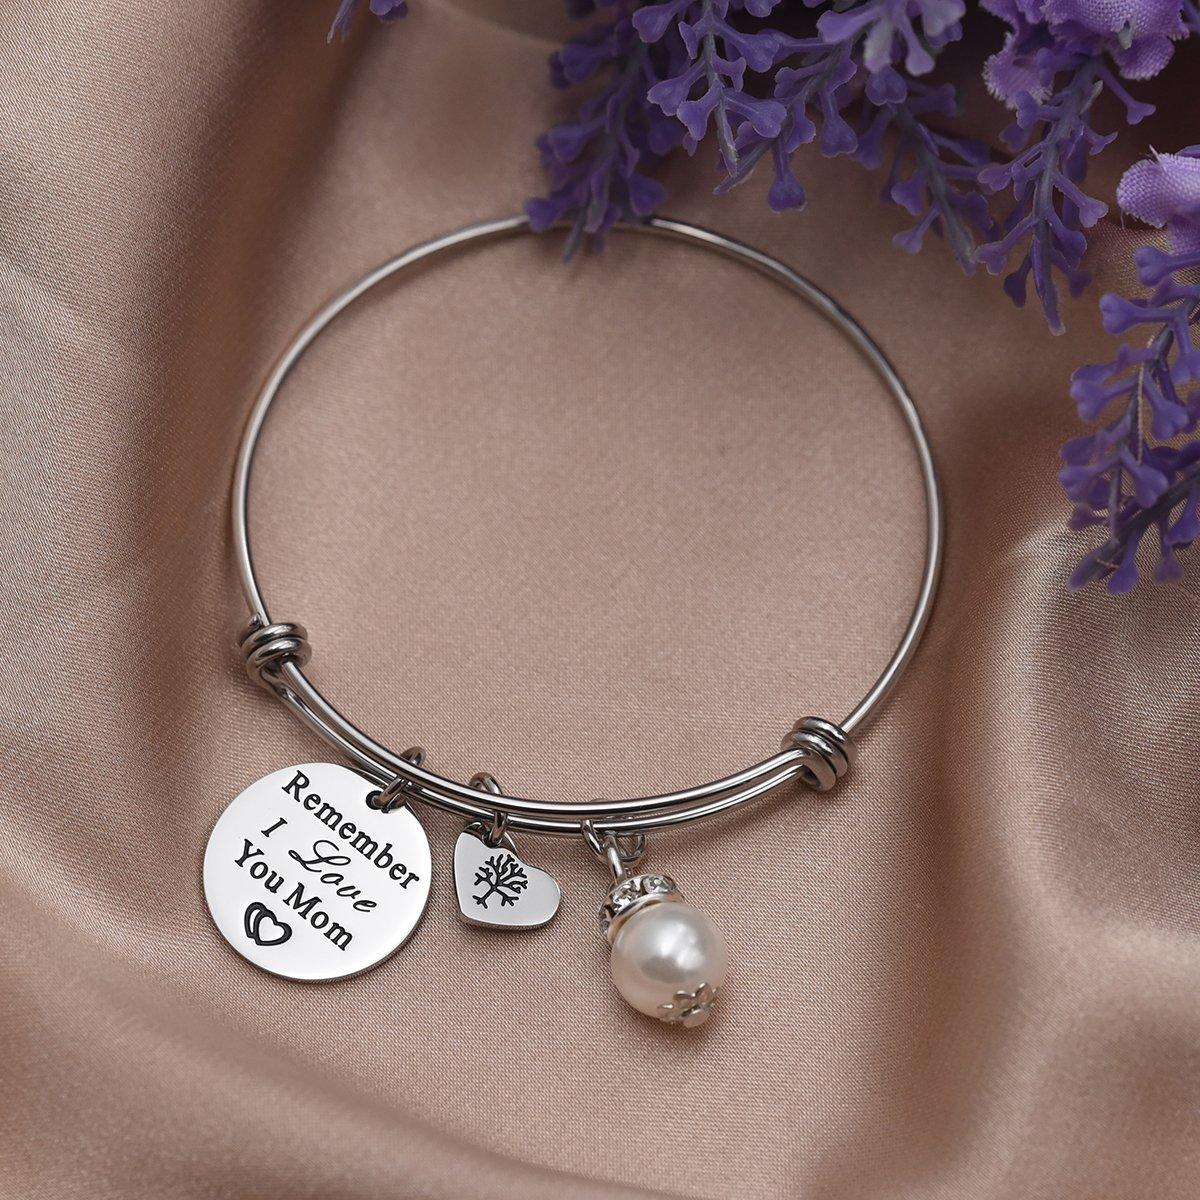 Remember I Love You Mom Bangle Bracelet (White) by LParkin (Image #3)